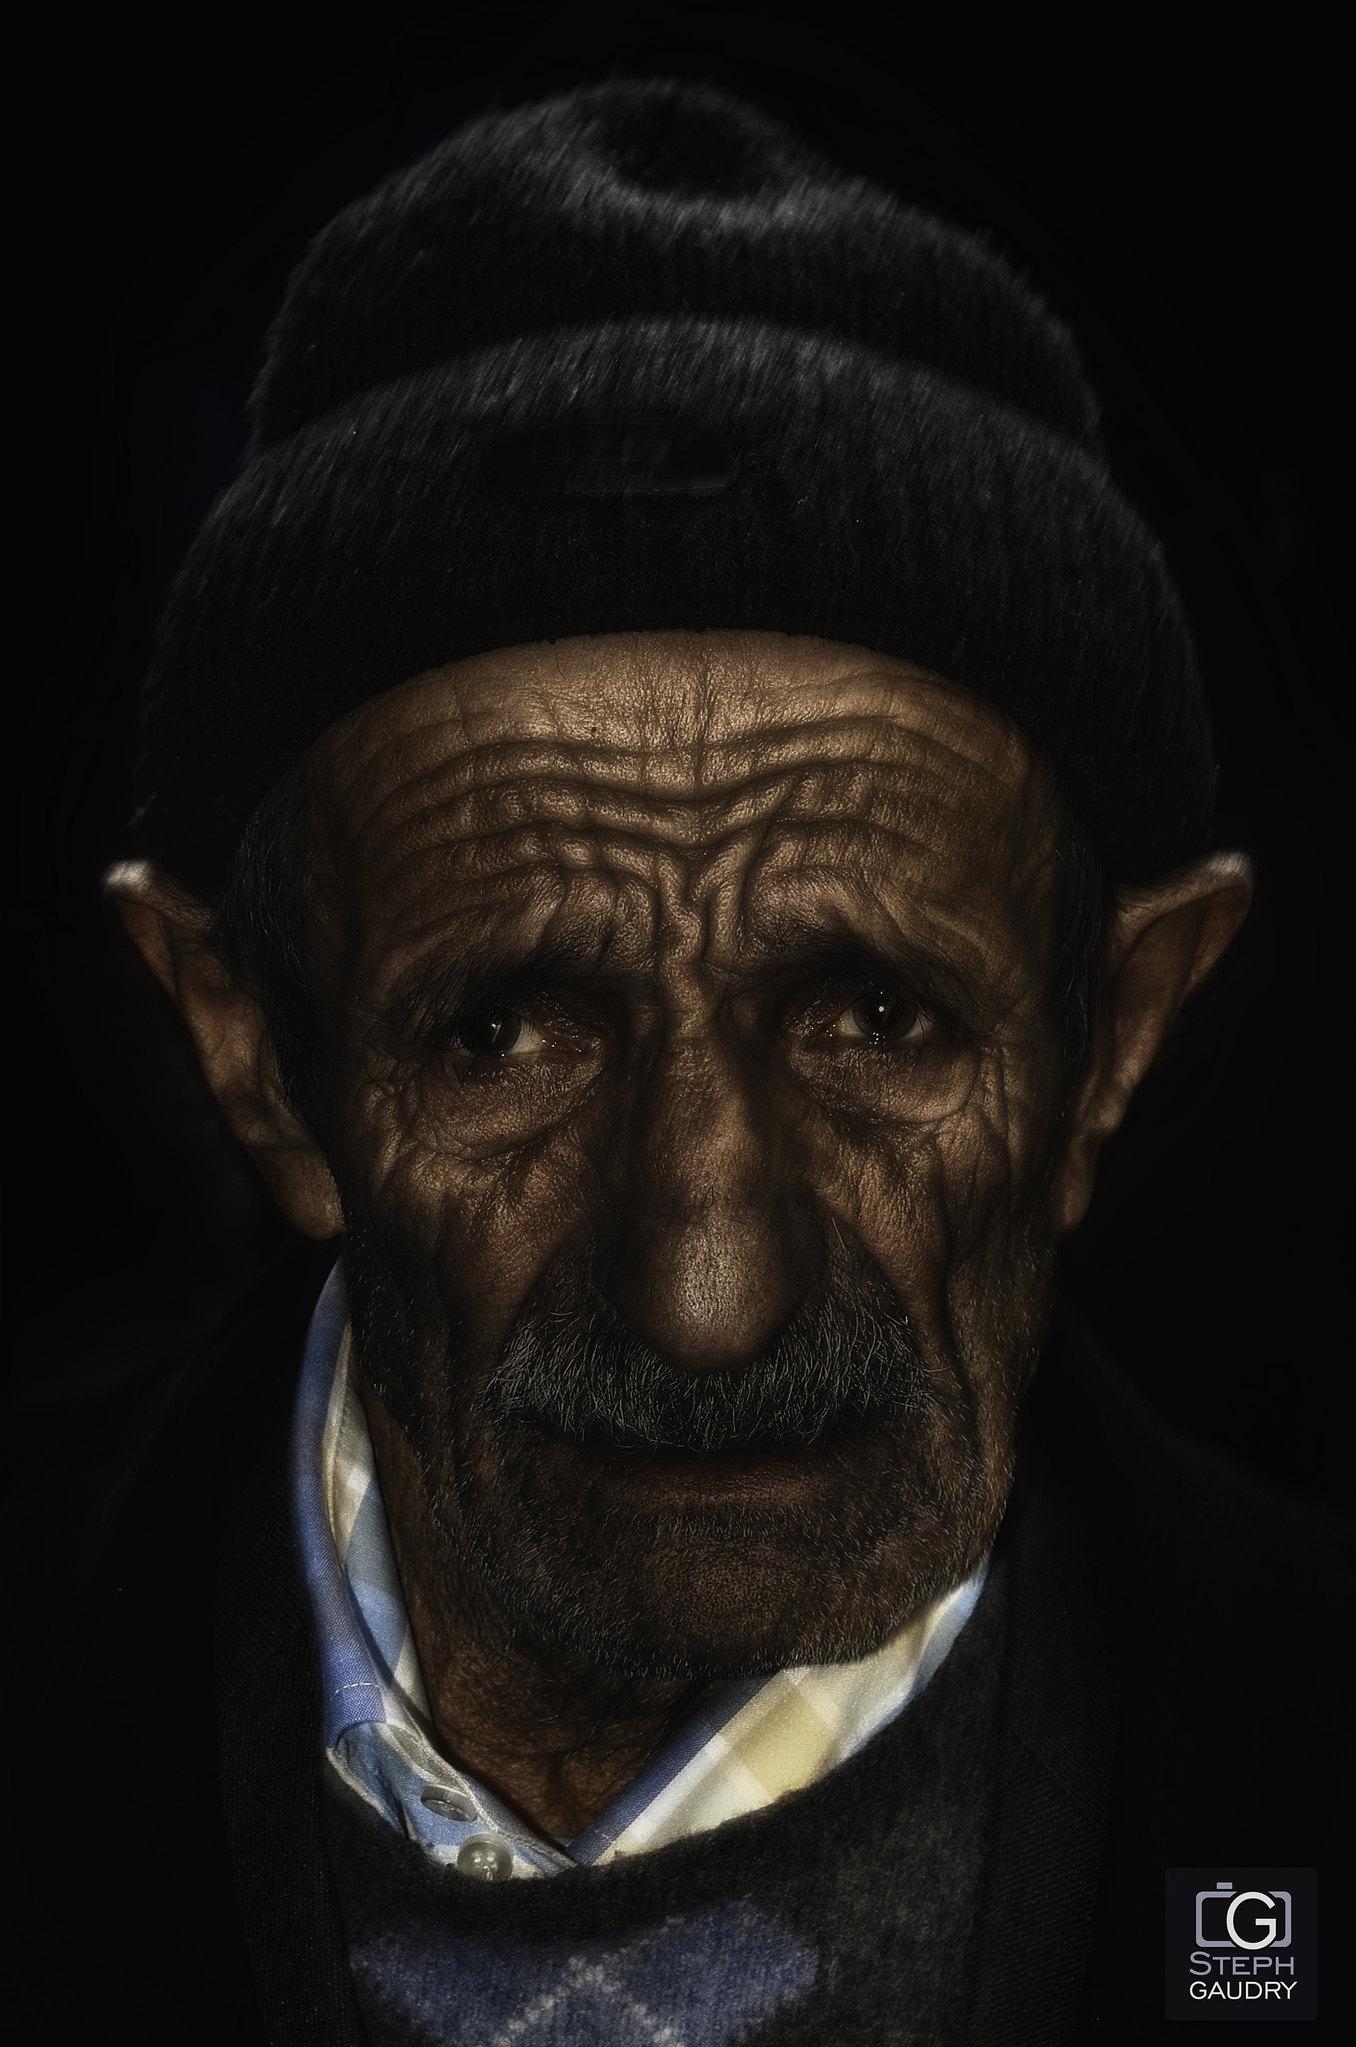 Istanbul, Portrait 201202-4 [Klik om de diavoorstelling te starten]